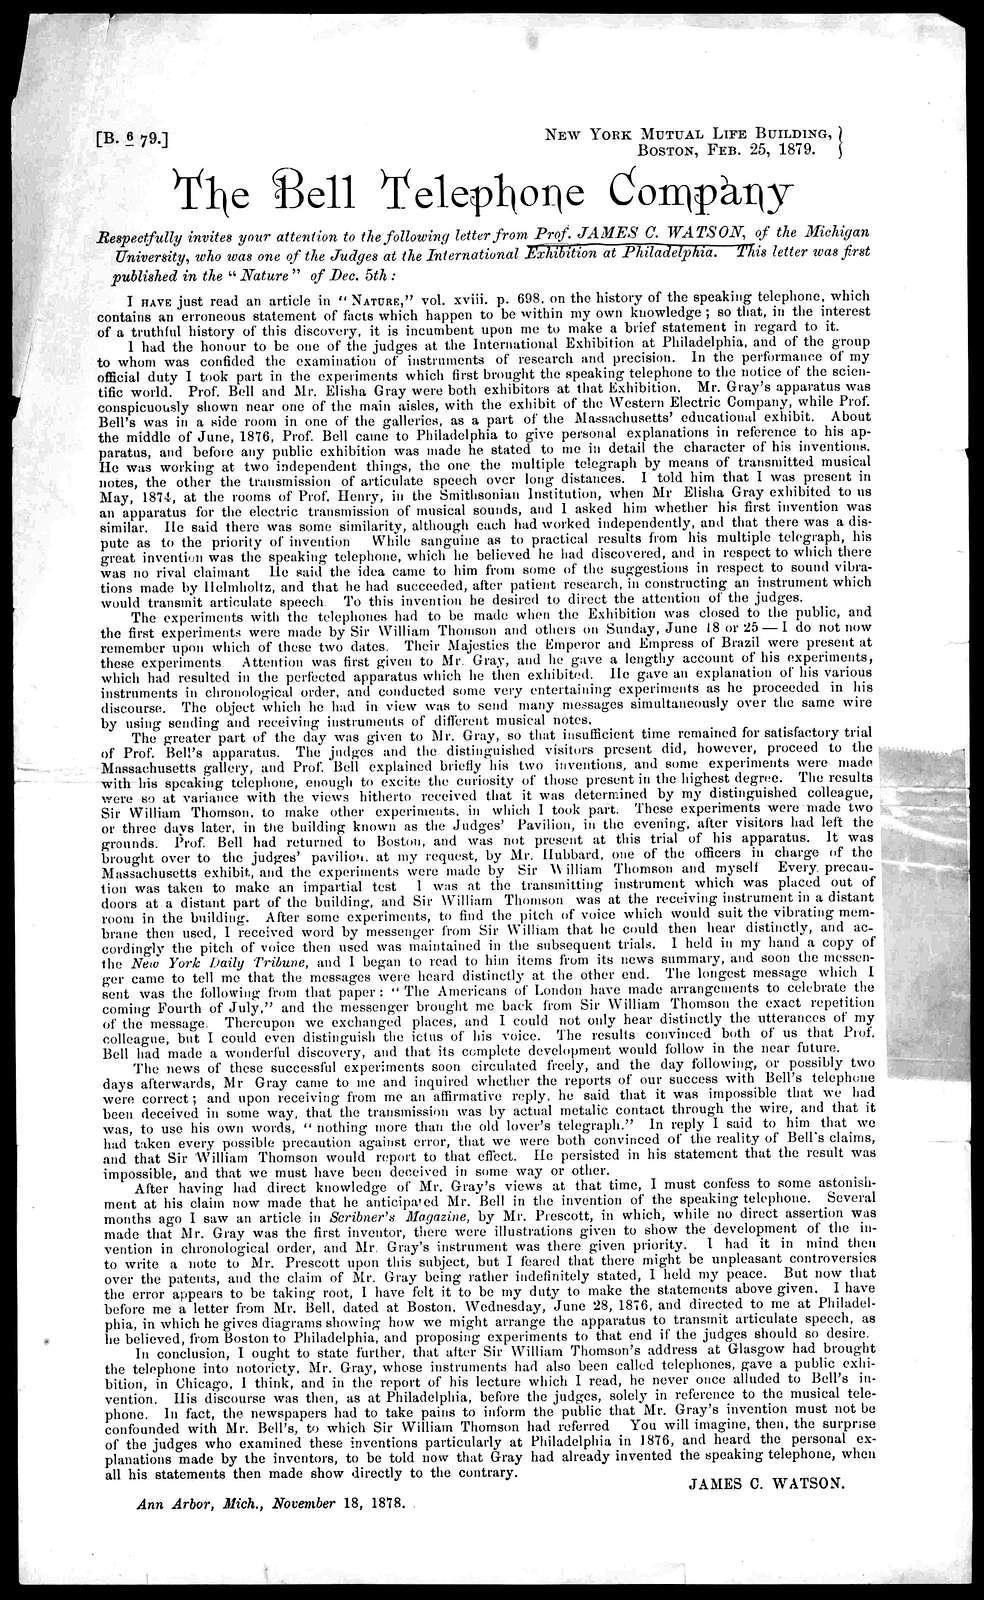 Circular by James C. Watson, February 25, 1879